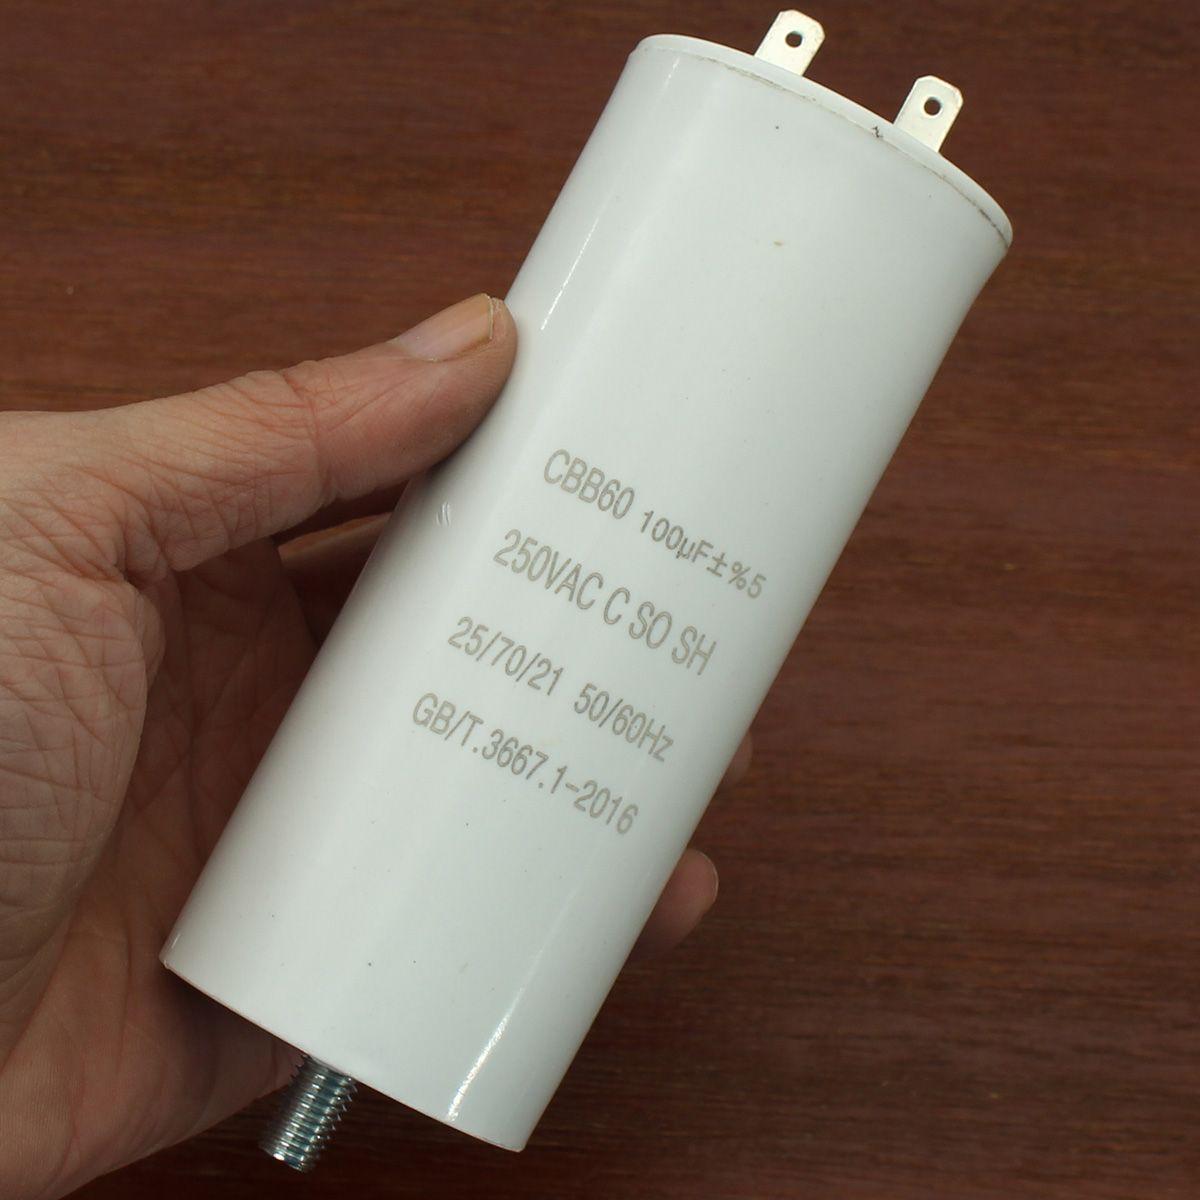 100uf Cbb60 Run Capacitor 250vac 100 Mfd Listed W Fixing Stud Capacitor List Diy Kits